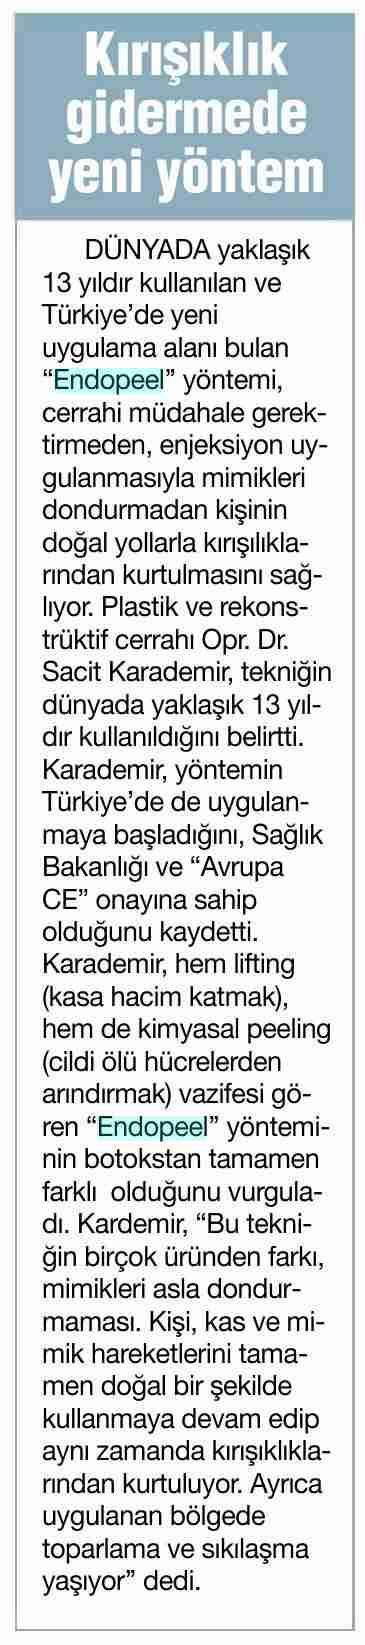 haberturk-gazetesi-03.08.2011